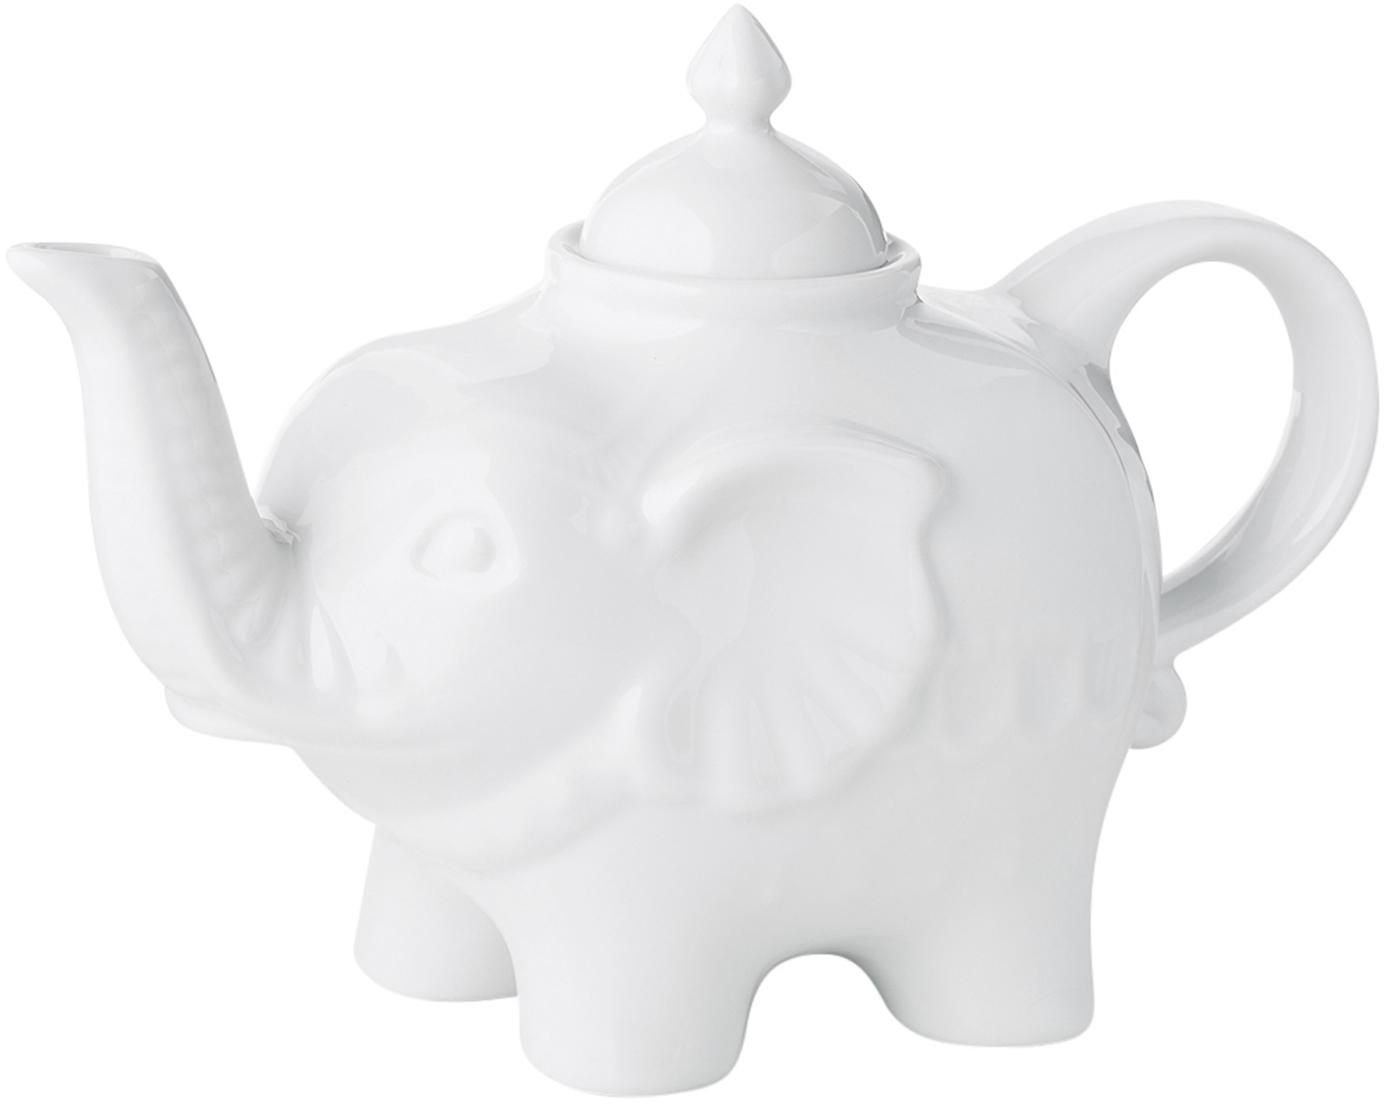 Teiera in porcellana Elephant, 820 ml, Ceramica, Bianco, 900 ml